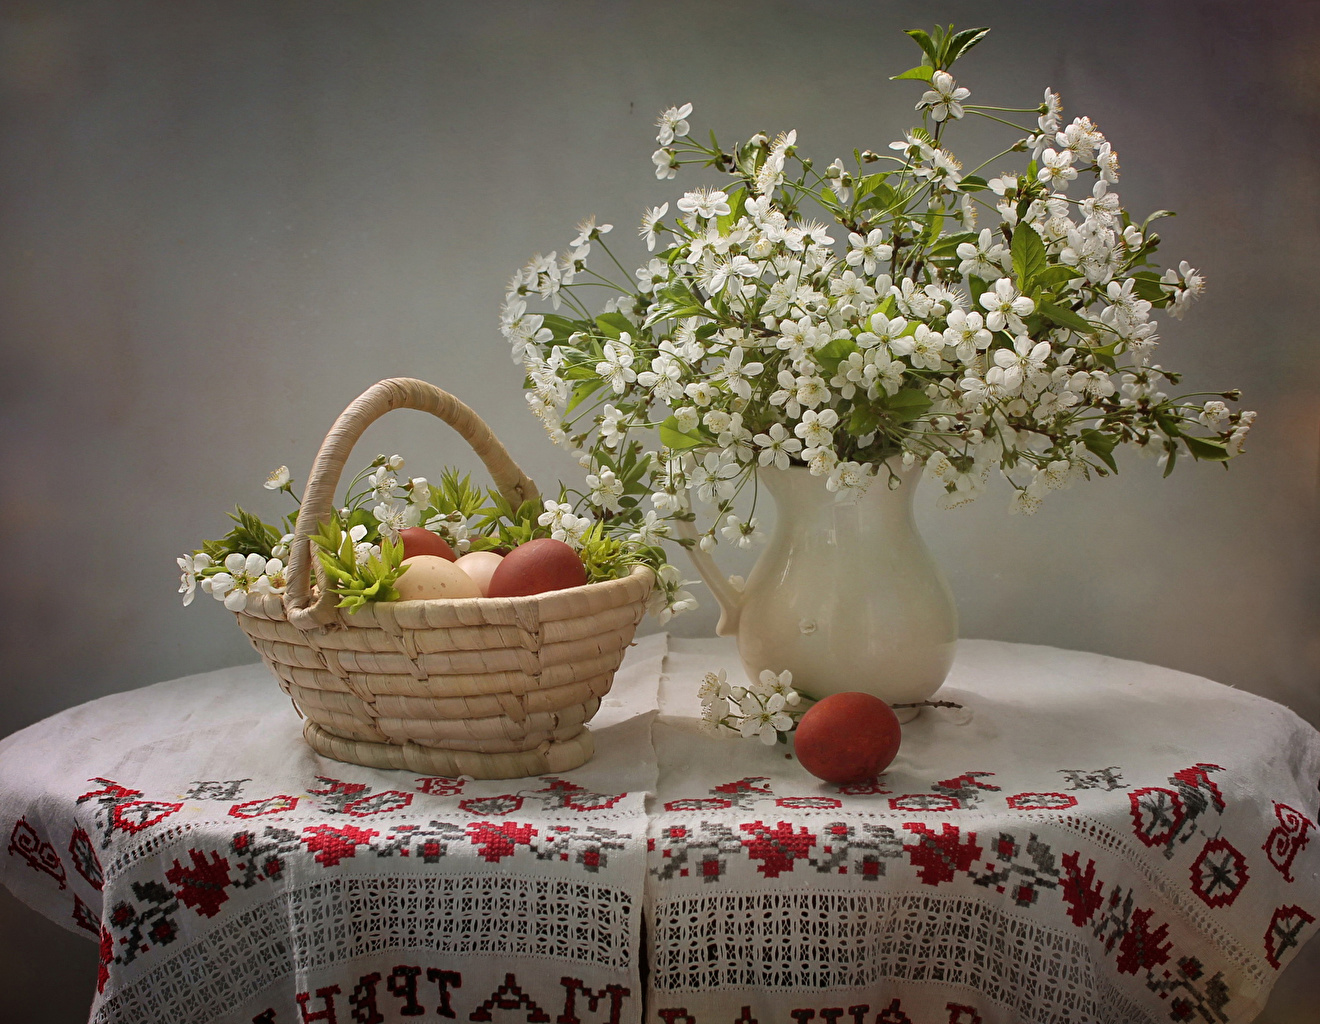 Pictures egg flower Wicker basket Vase Table Branches Still-life Flowering trees Eggs Flowers